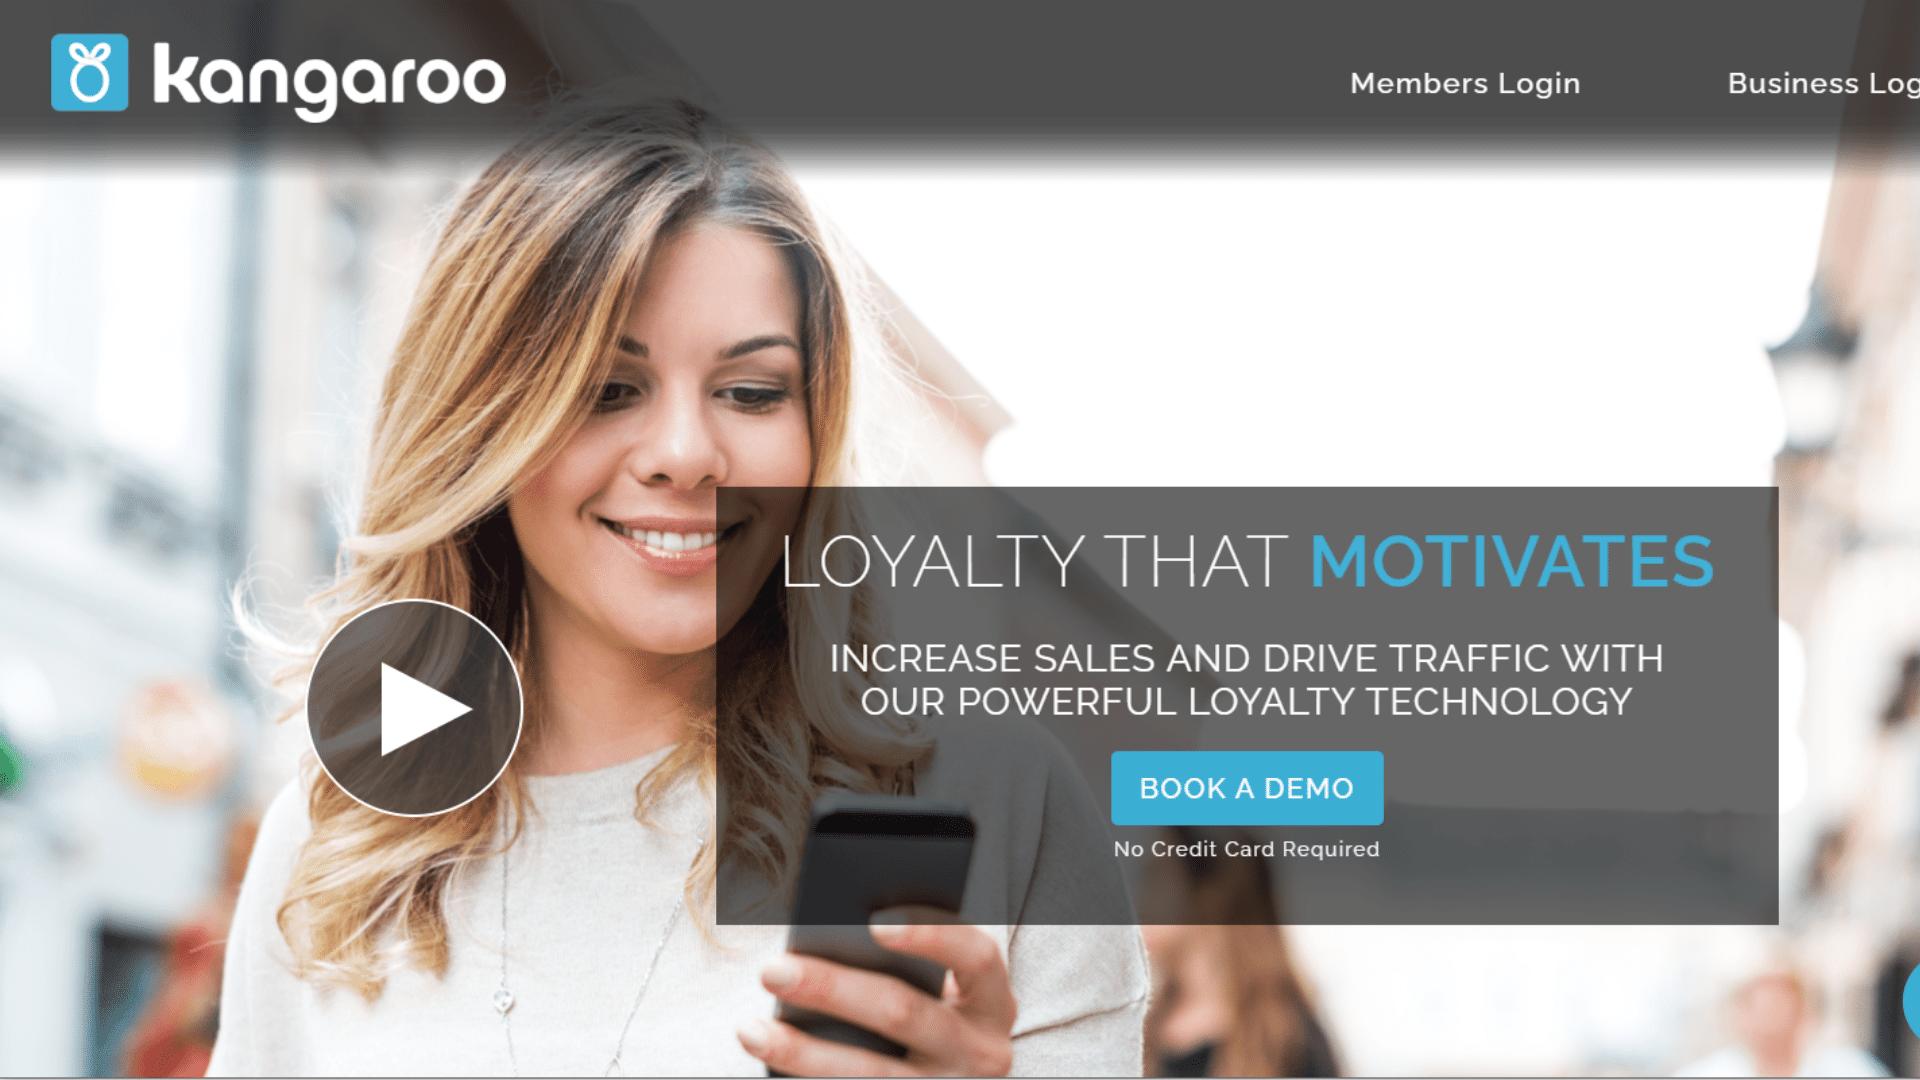 Kangaroo customer advocacy software